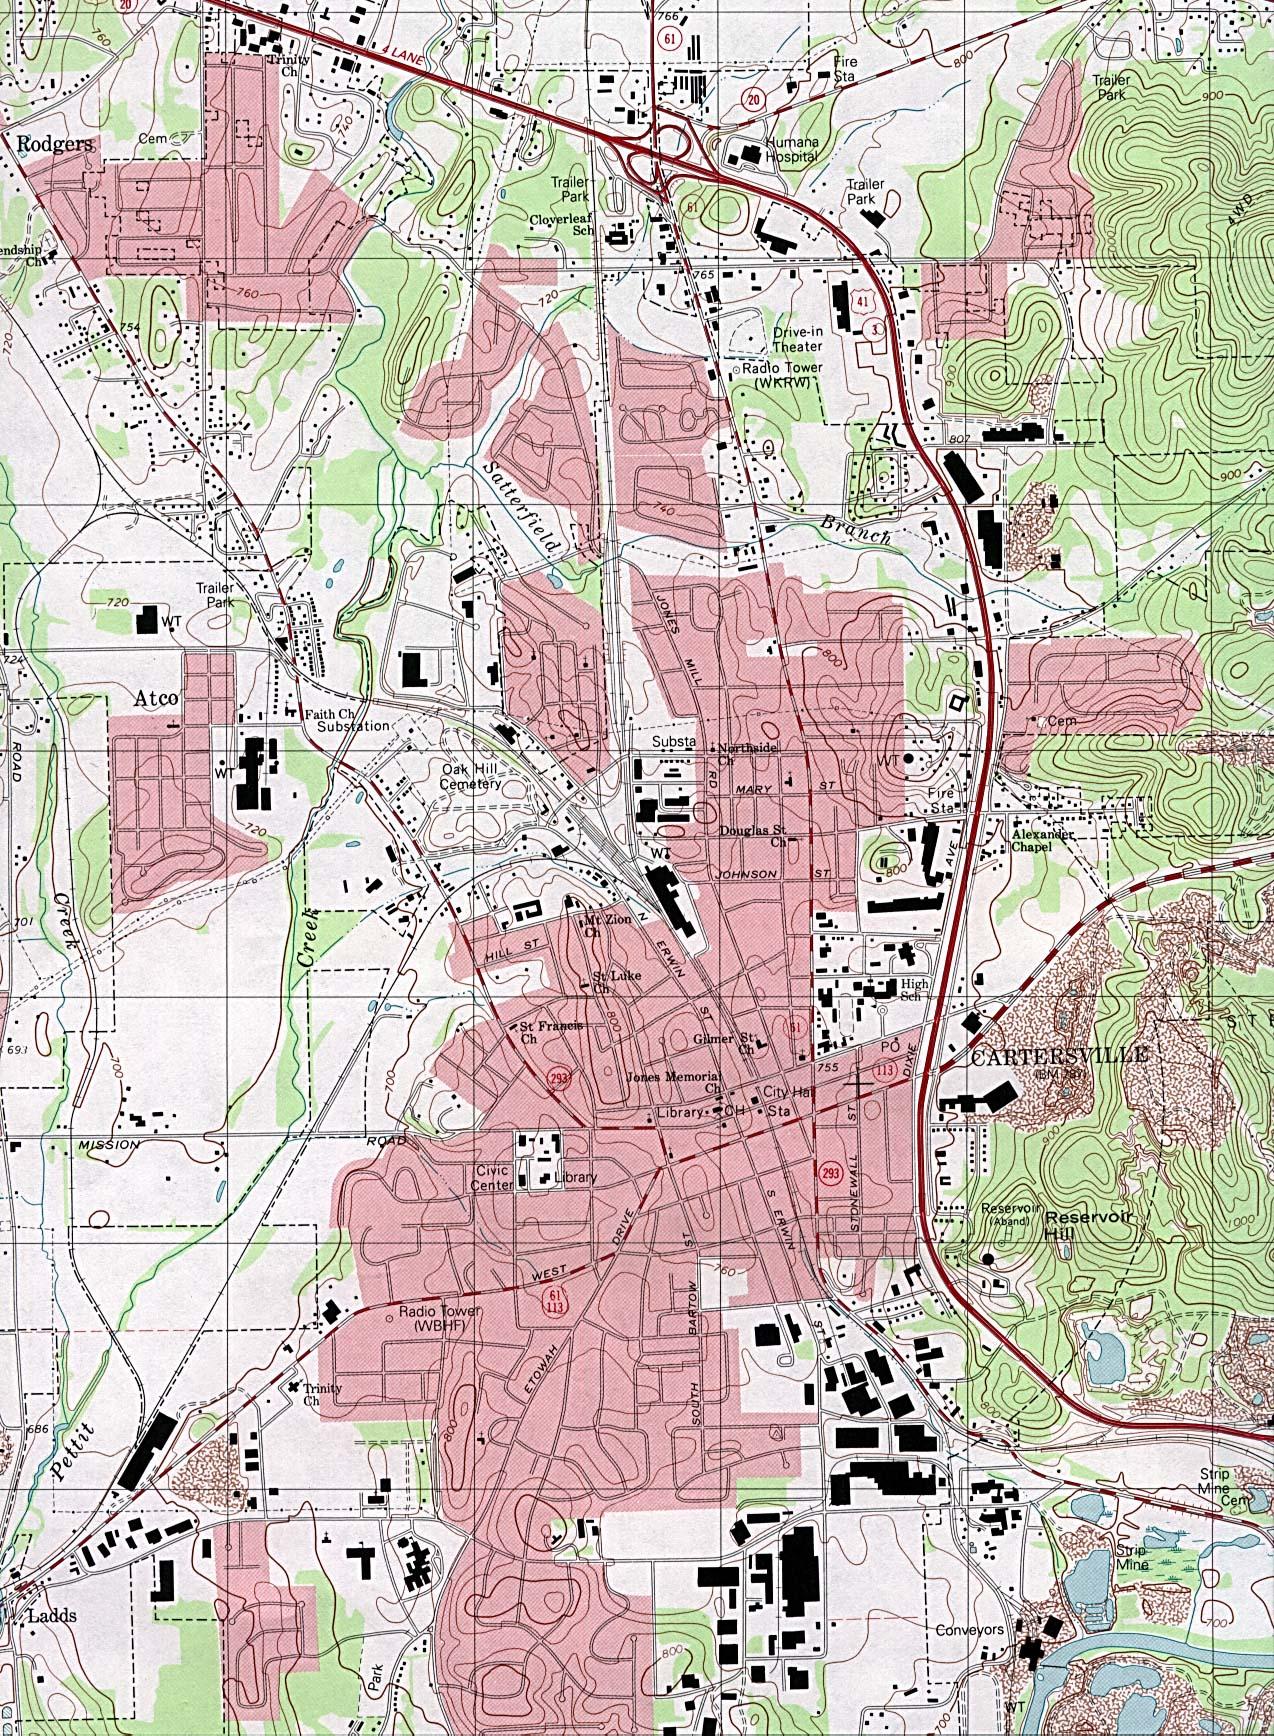 Cartersville Topographic City Map, Georgia, United States